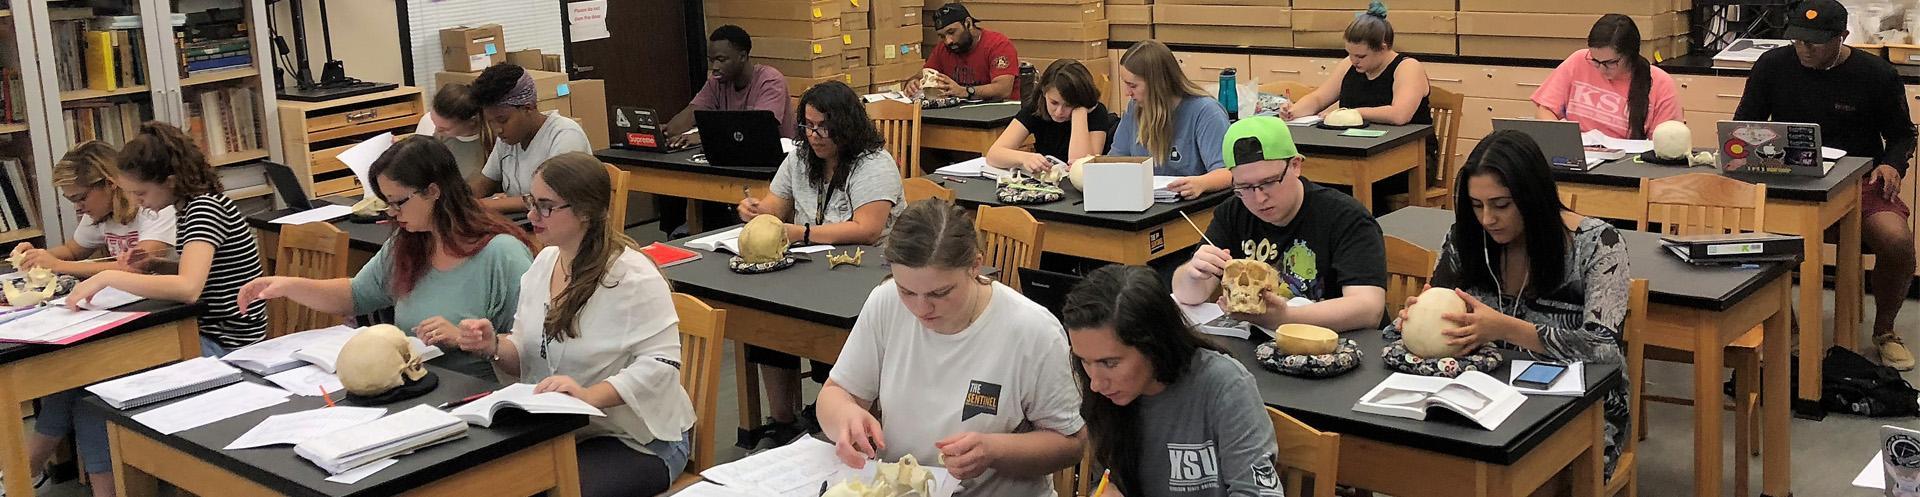 Study the Human Skeleton